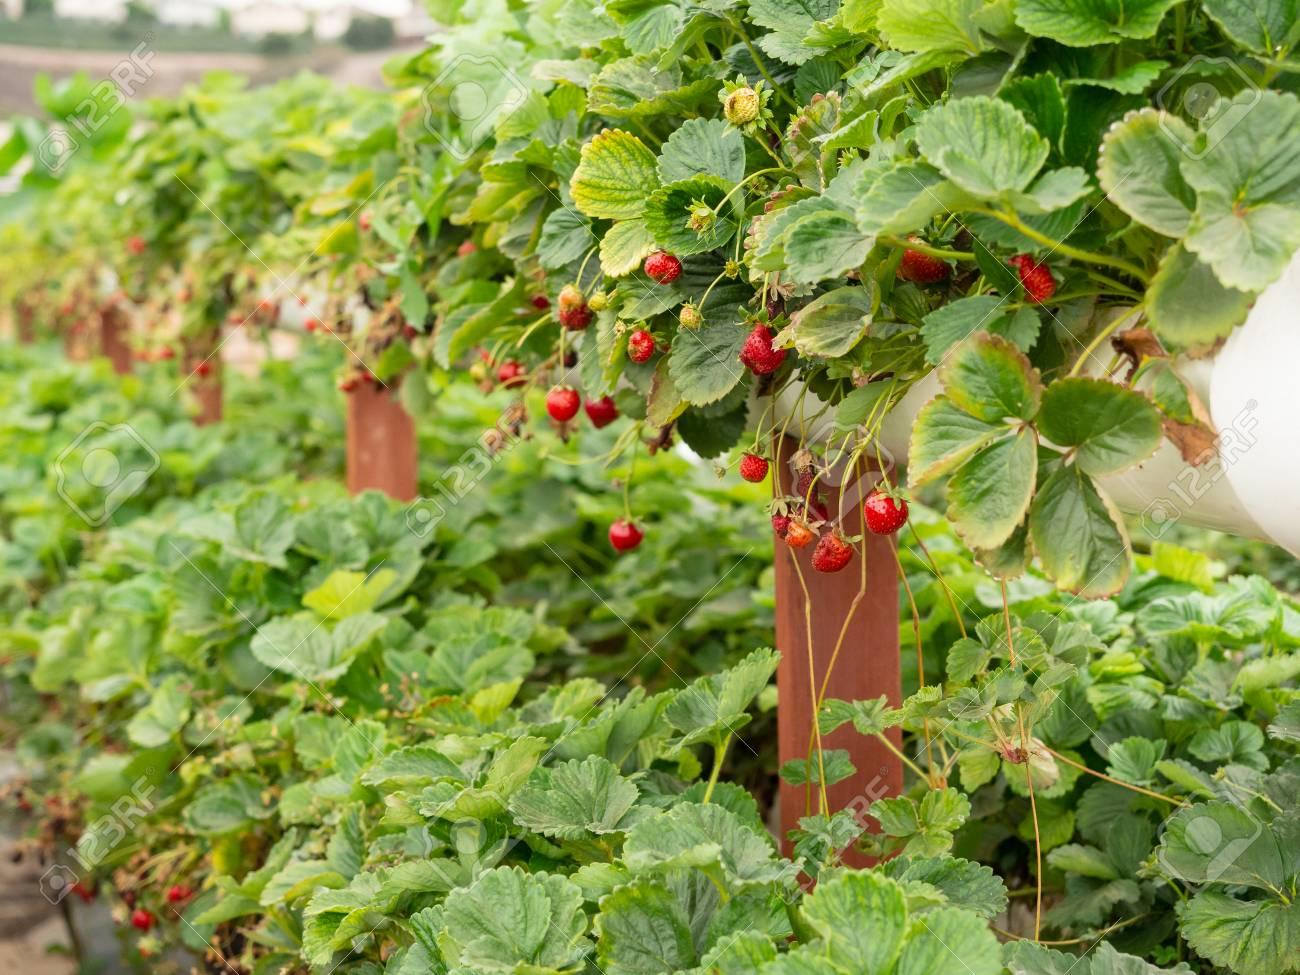 Organic strawberry growing on hydroponic farm outside - 115343934